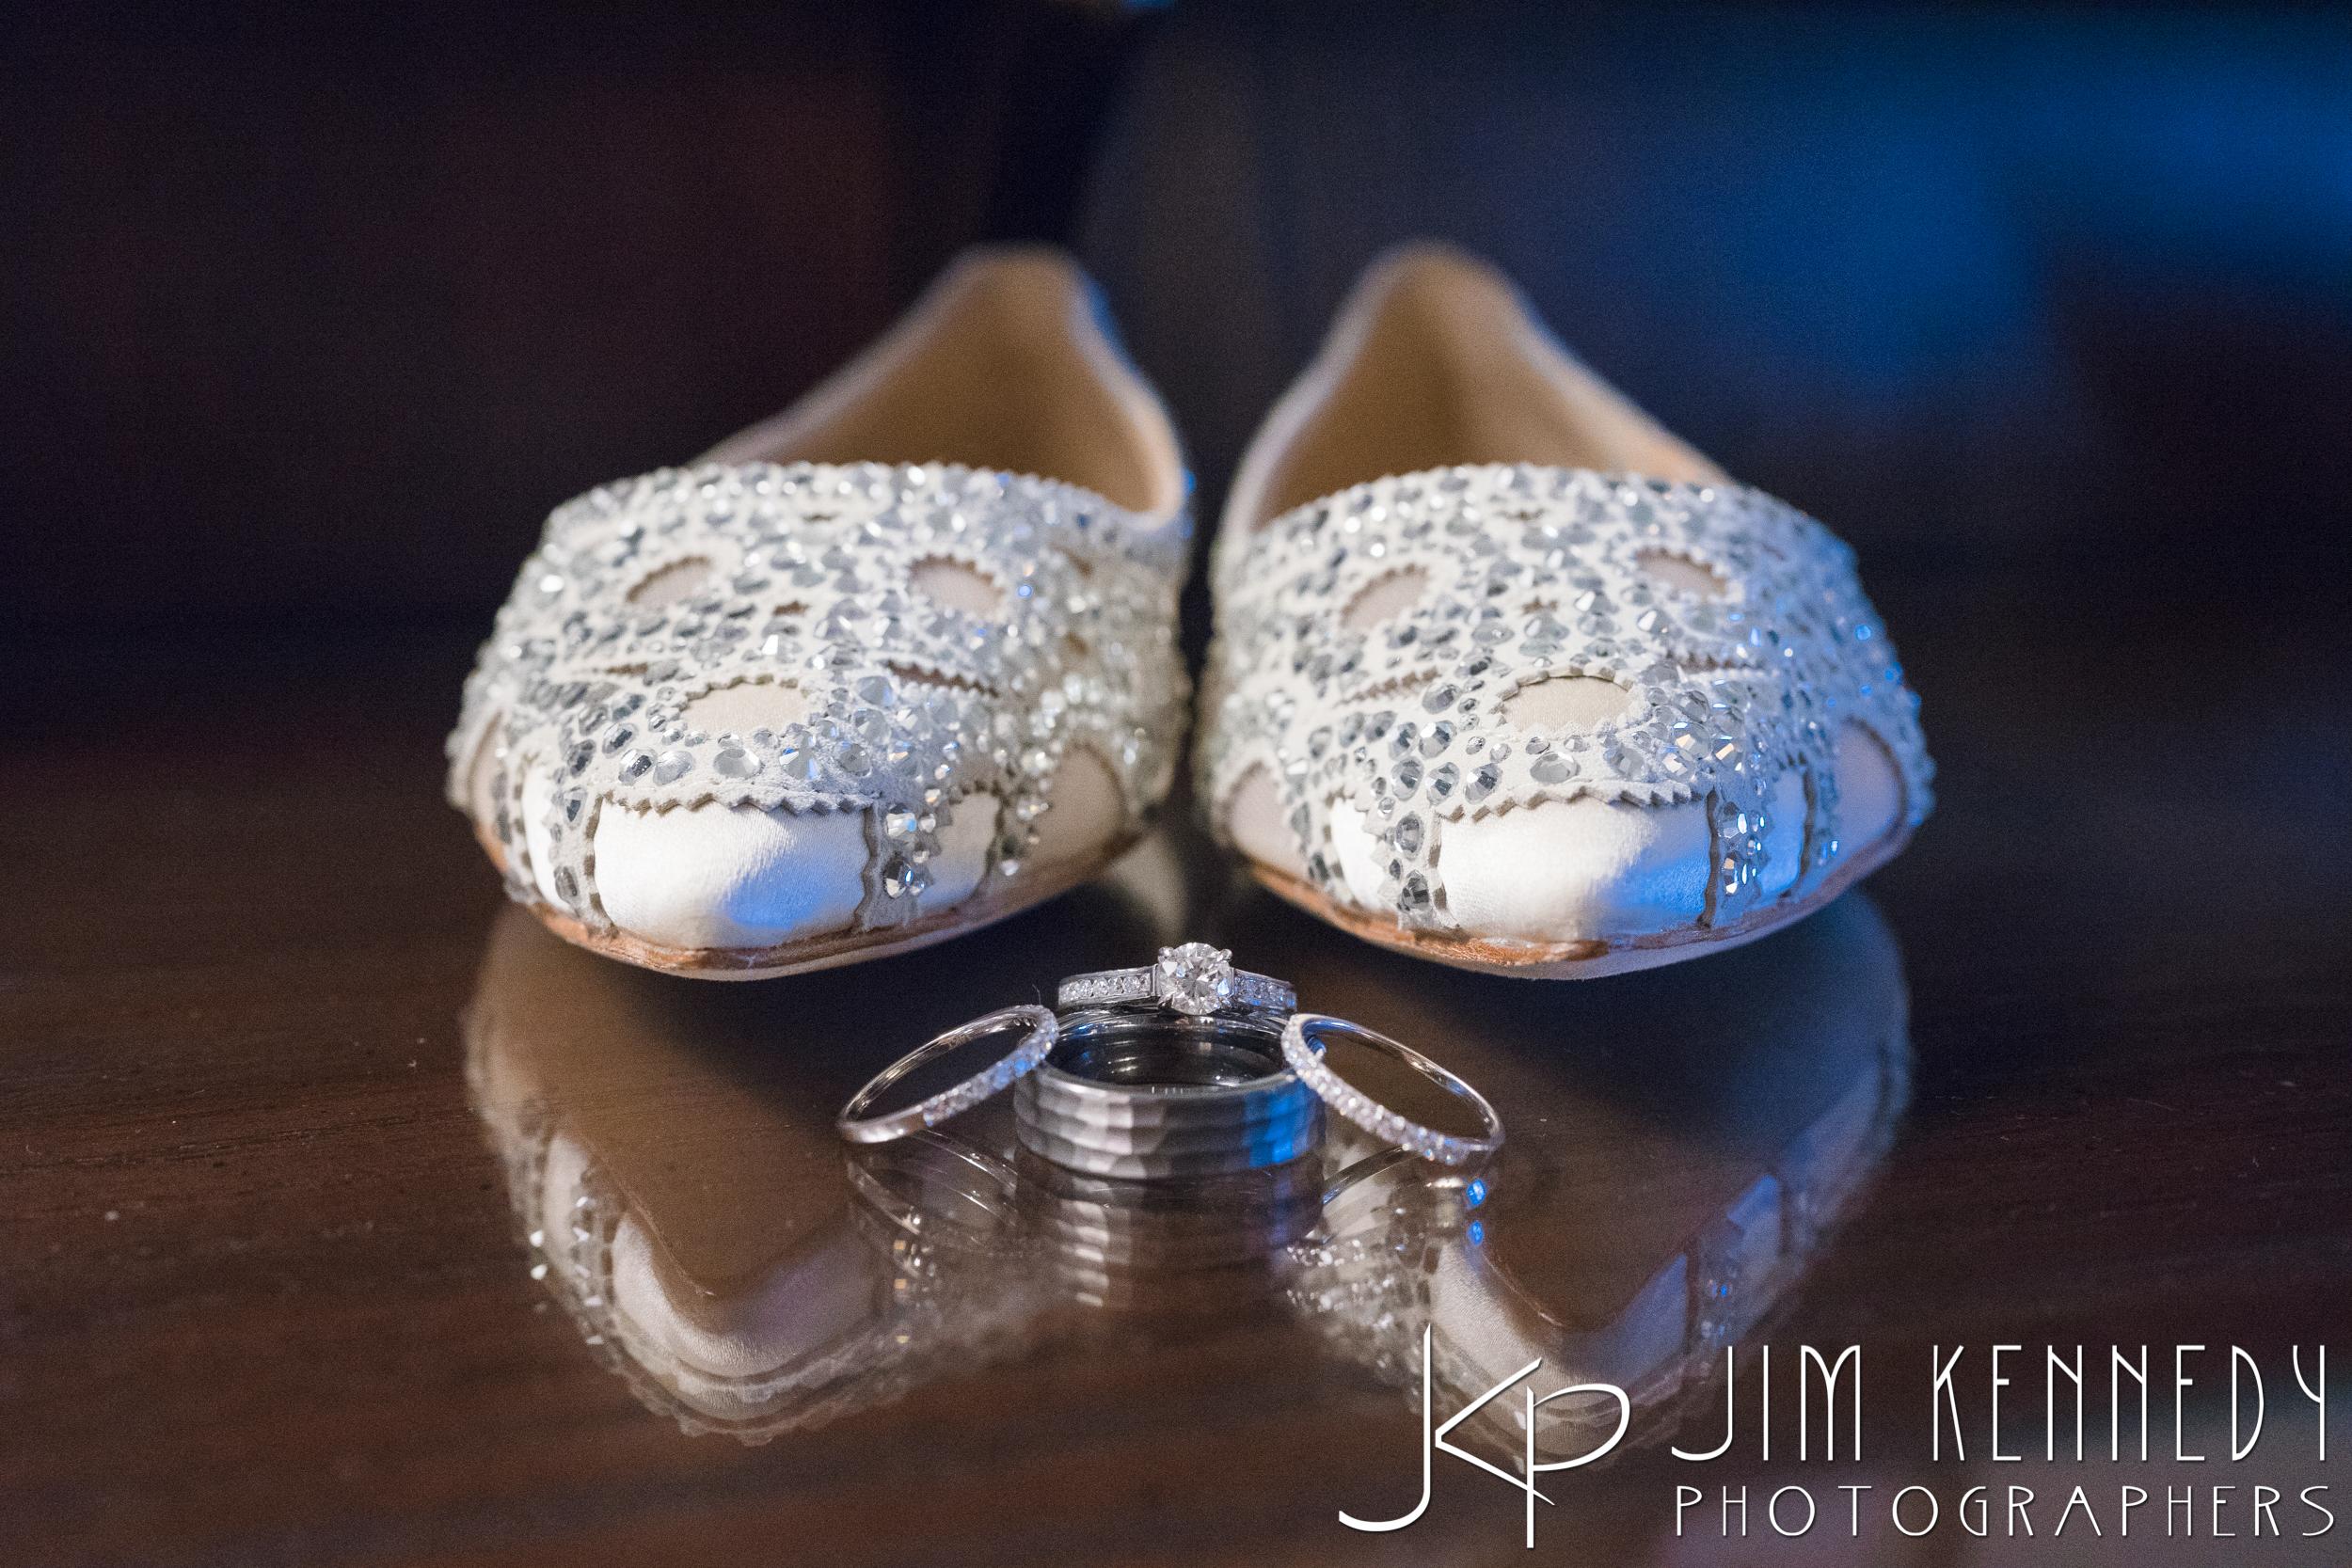 jim_kennedy_photographers_highland_springs_wedding_caitlyn_0006.jpg